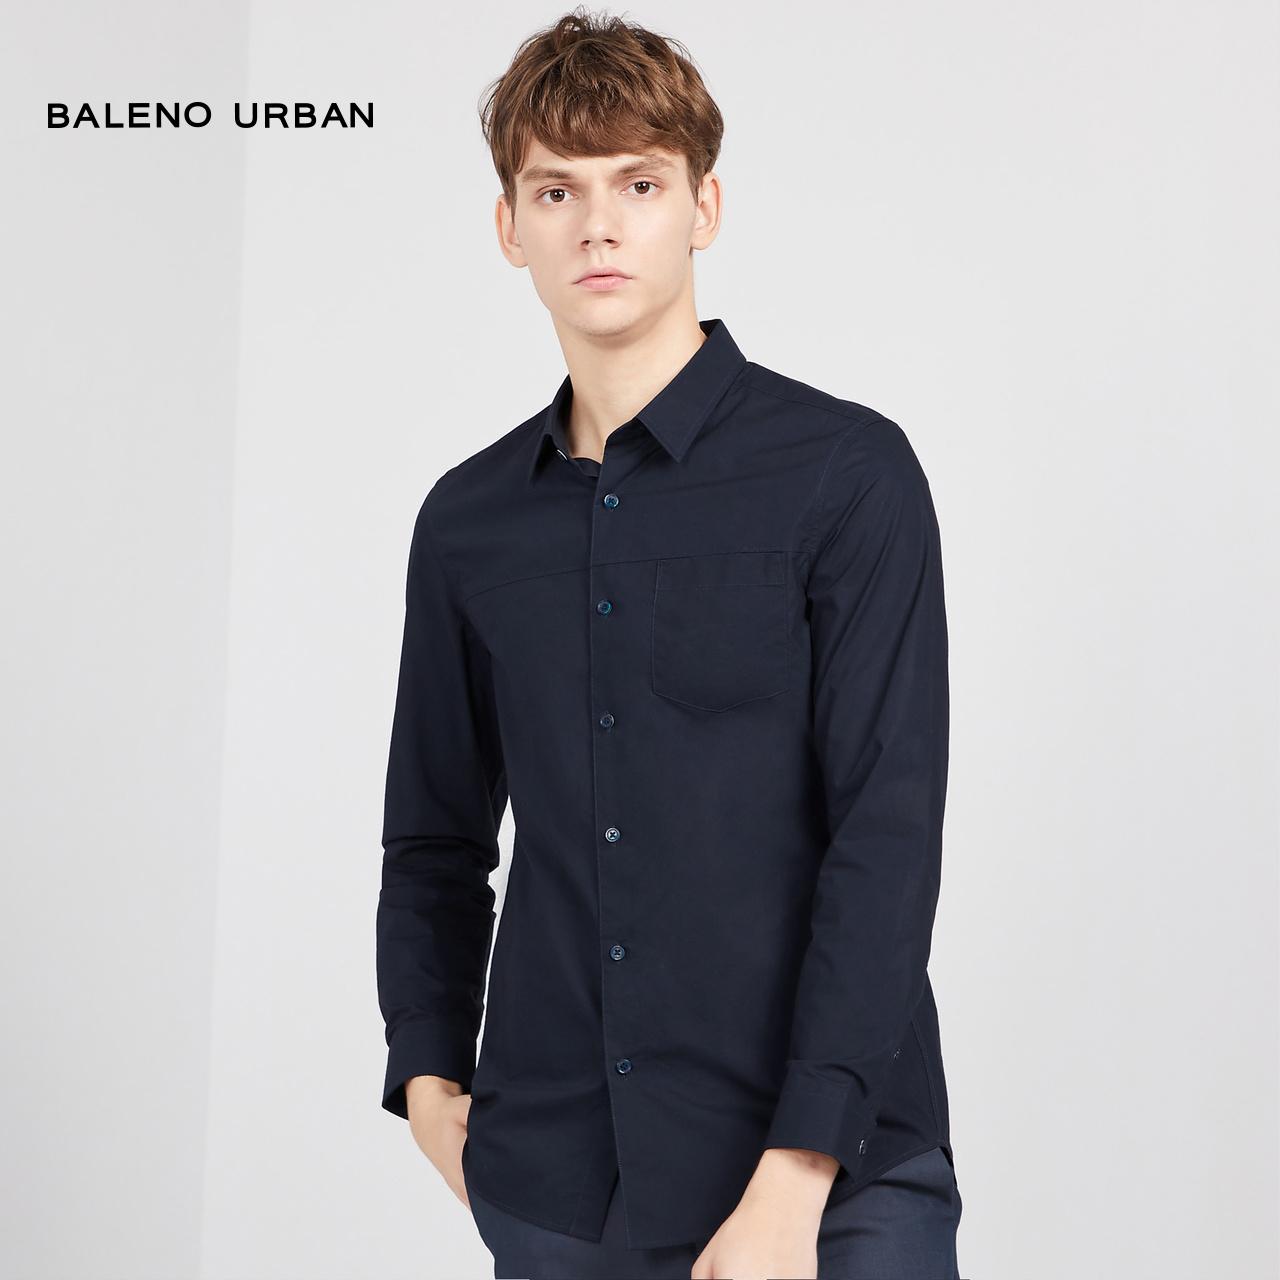 Baleno 班尼路 85834009 男士衬衫 59.9元